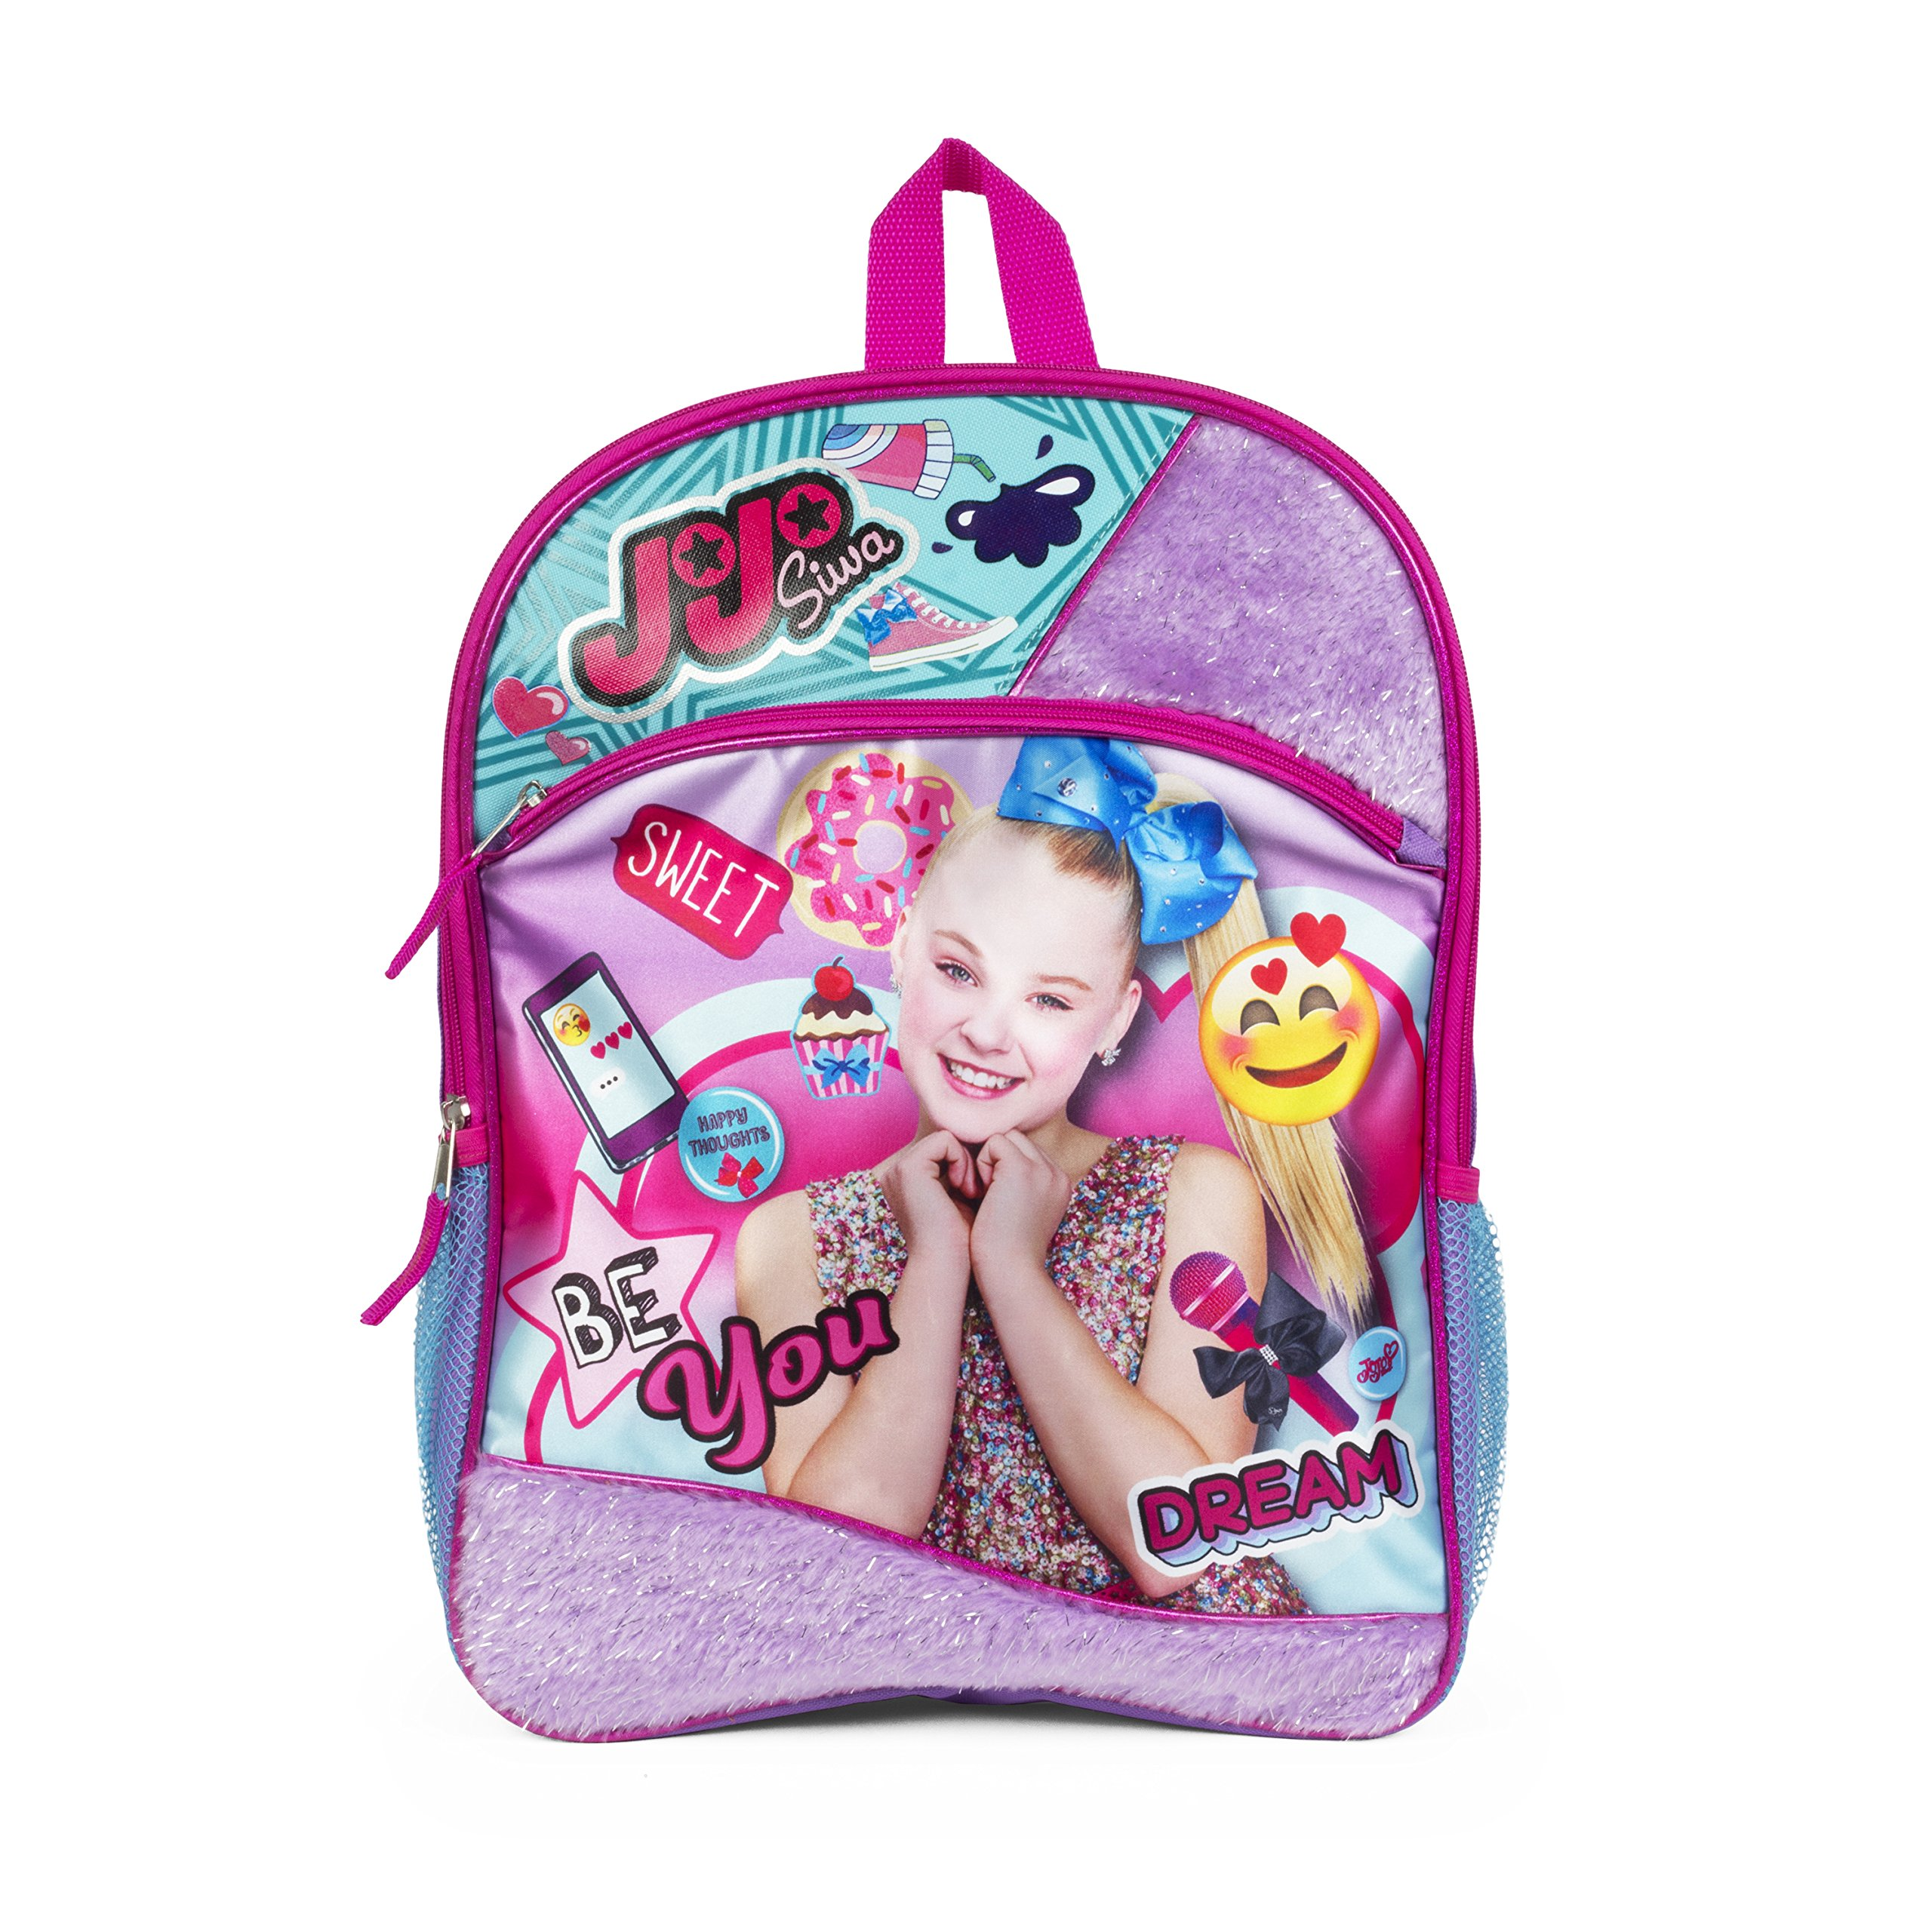 "Nickelodeon JoJo Siwa Purple Sequin Emoji Be You 16"" Inch Backpack Bag"